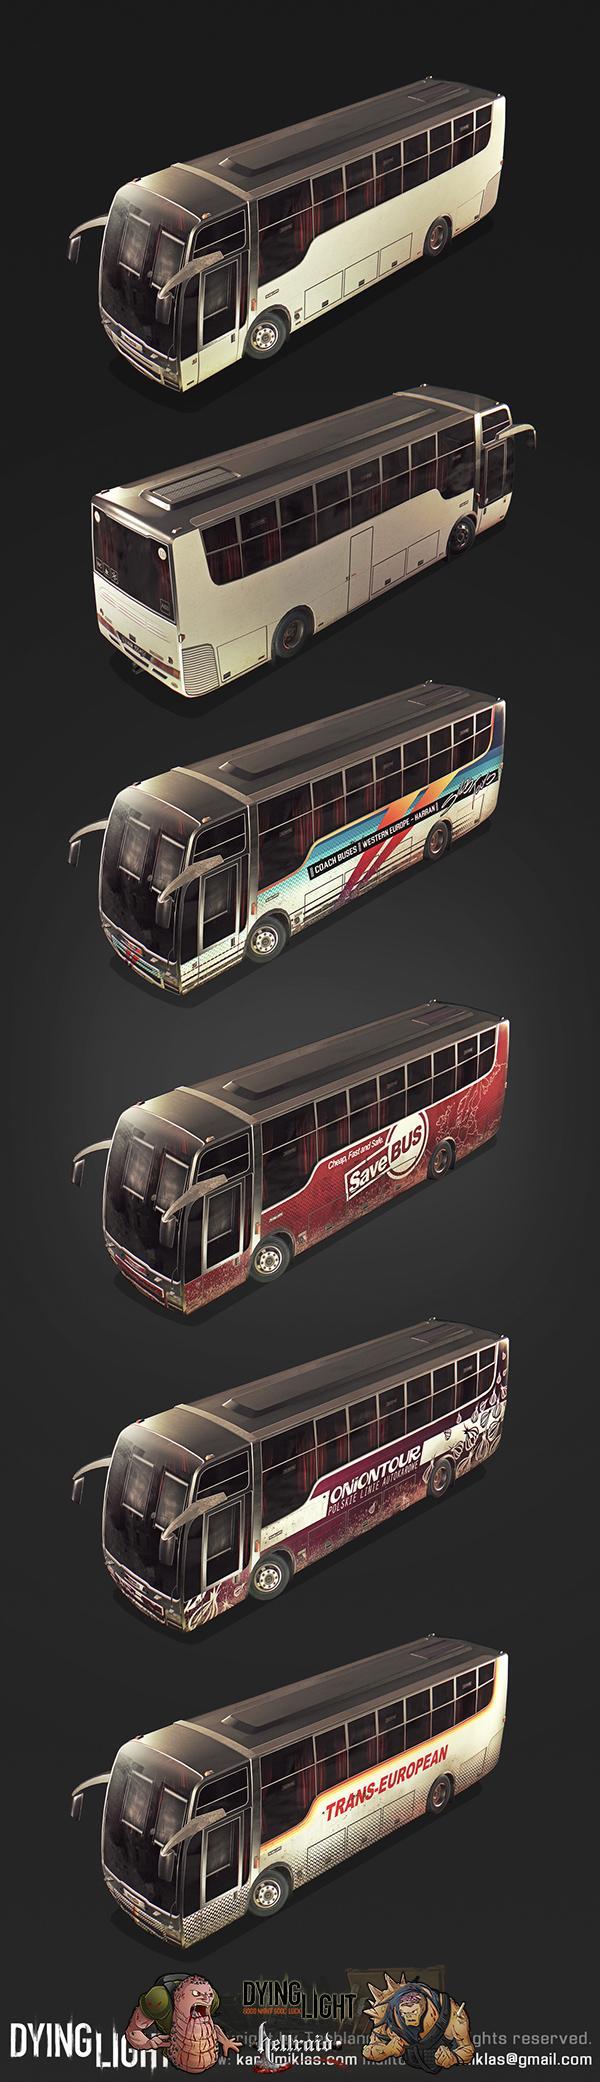 Dying Light 3D Art - взгляд на один из автомобилей изнутри-7